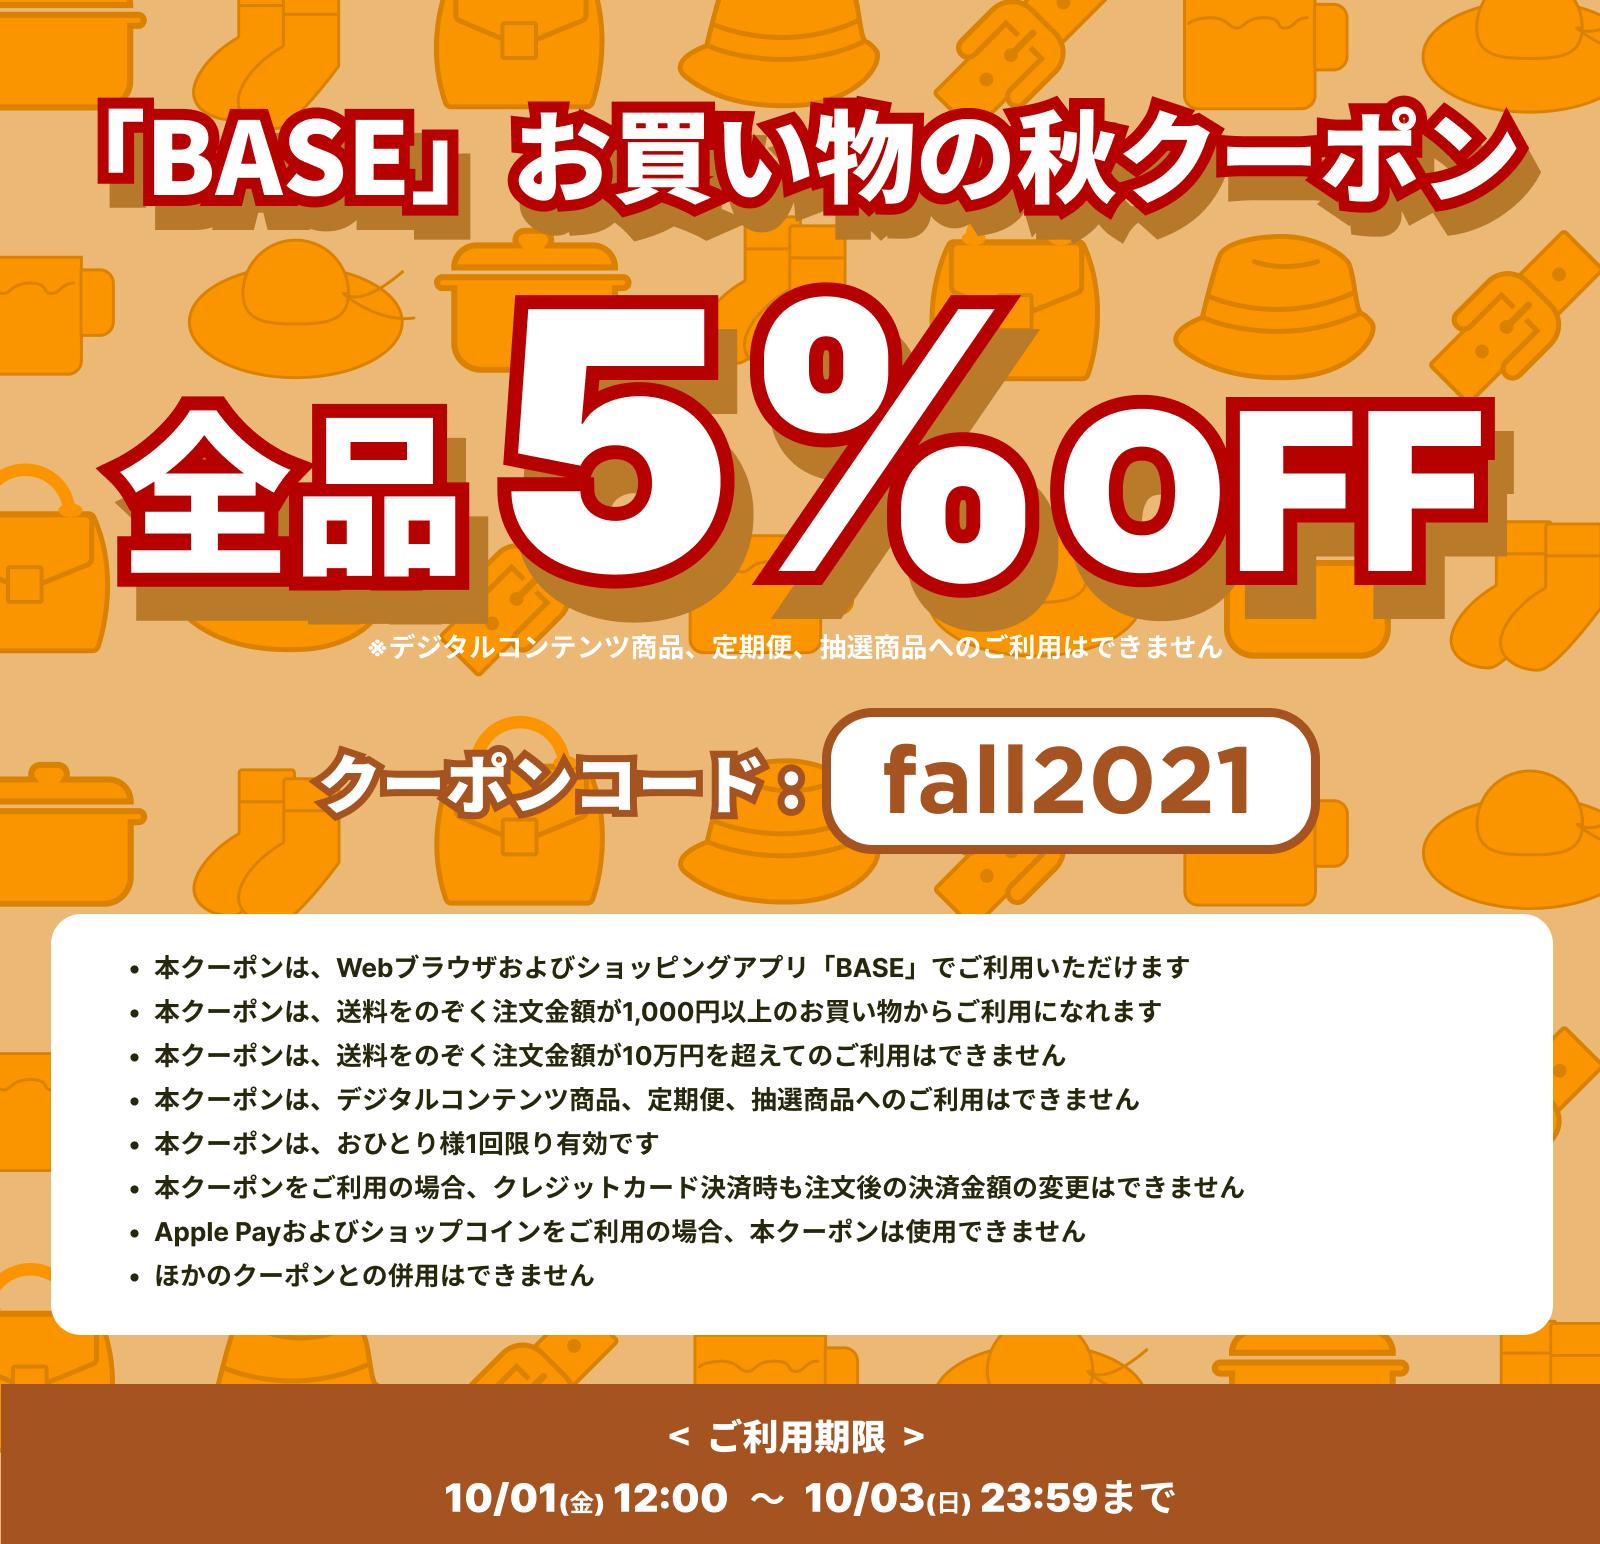 <informations ・ Octobre 2021 / 10月の営業予定>_e0055358_20135574.png